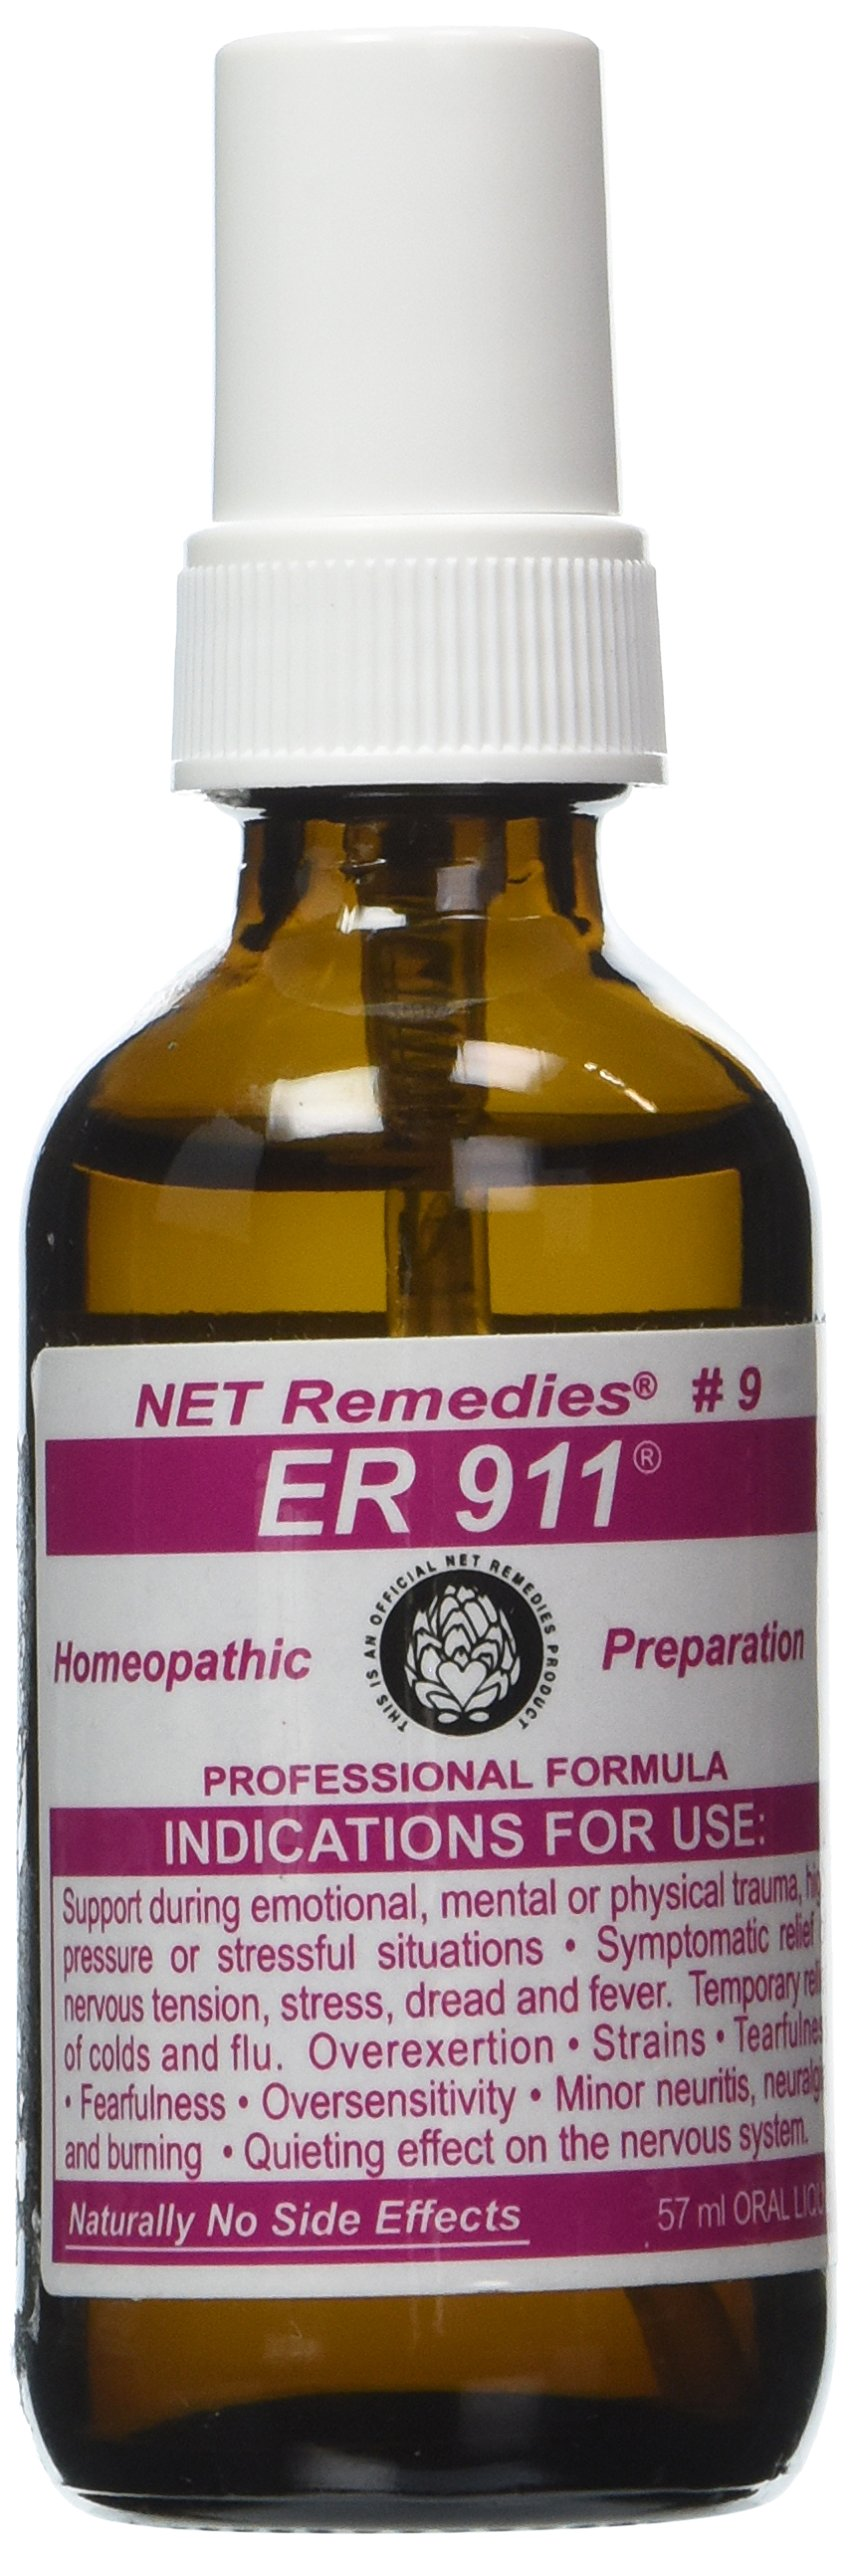 amazon com net remedies 12 flu immune releaf of flu